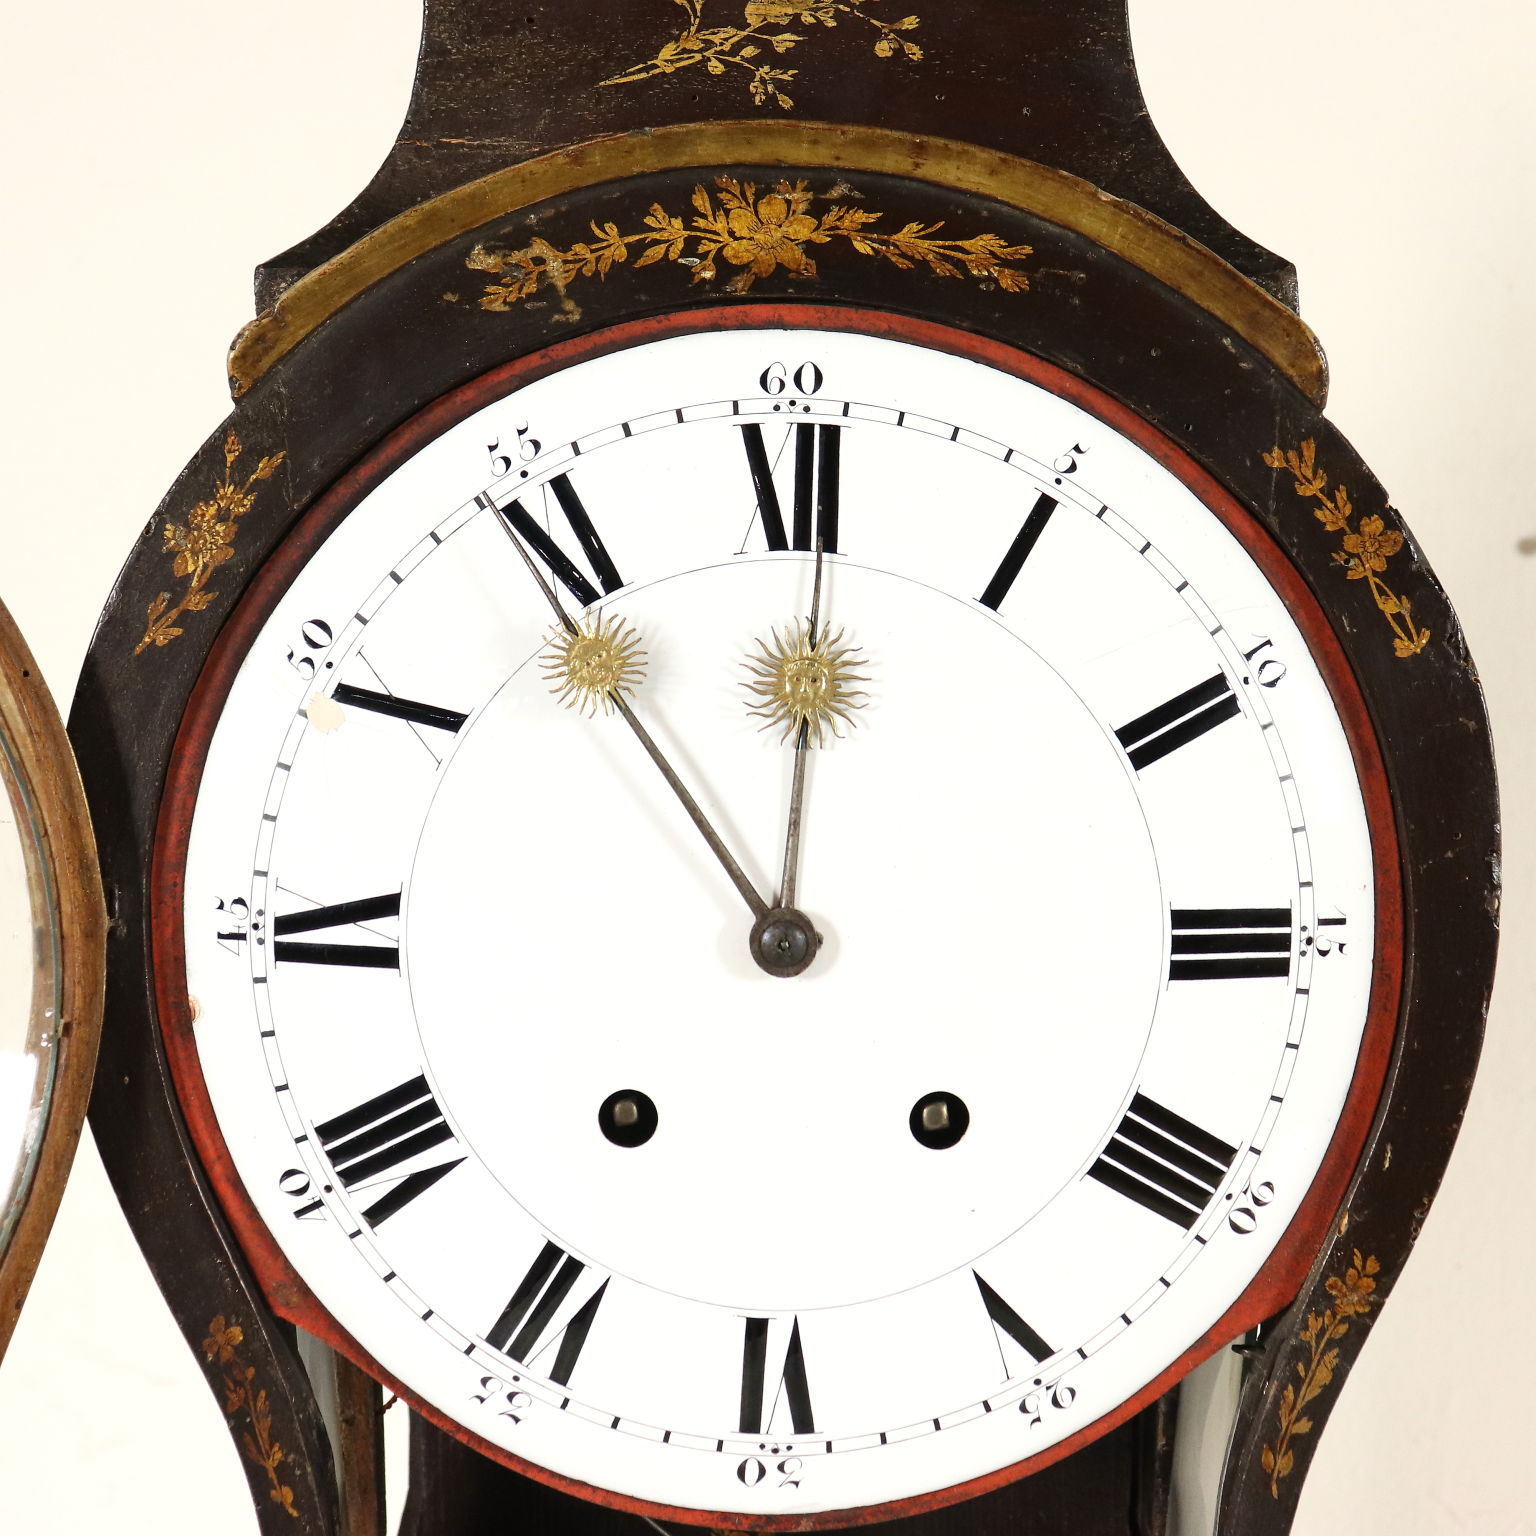 Soporte de relojes terciopelo sustancia relojes al plato etapas 3 pulsera soporte en terciopelo negro